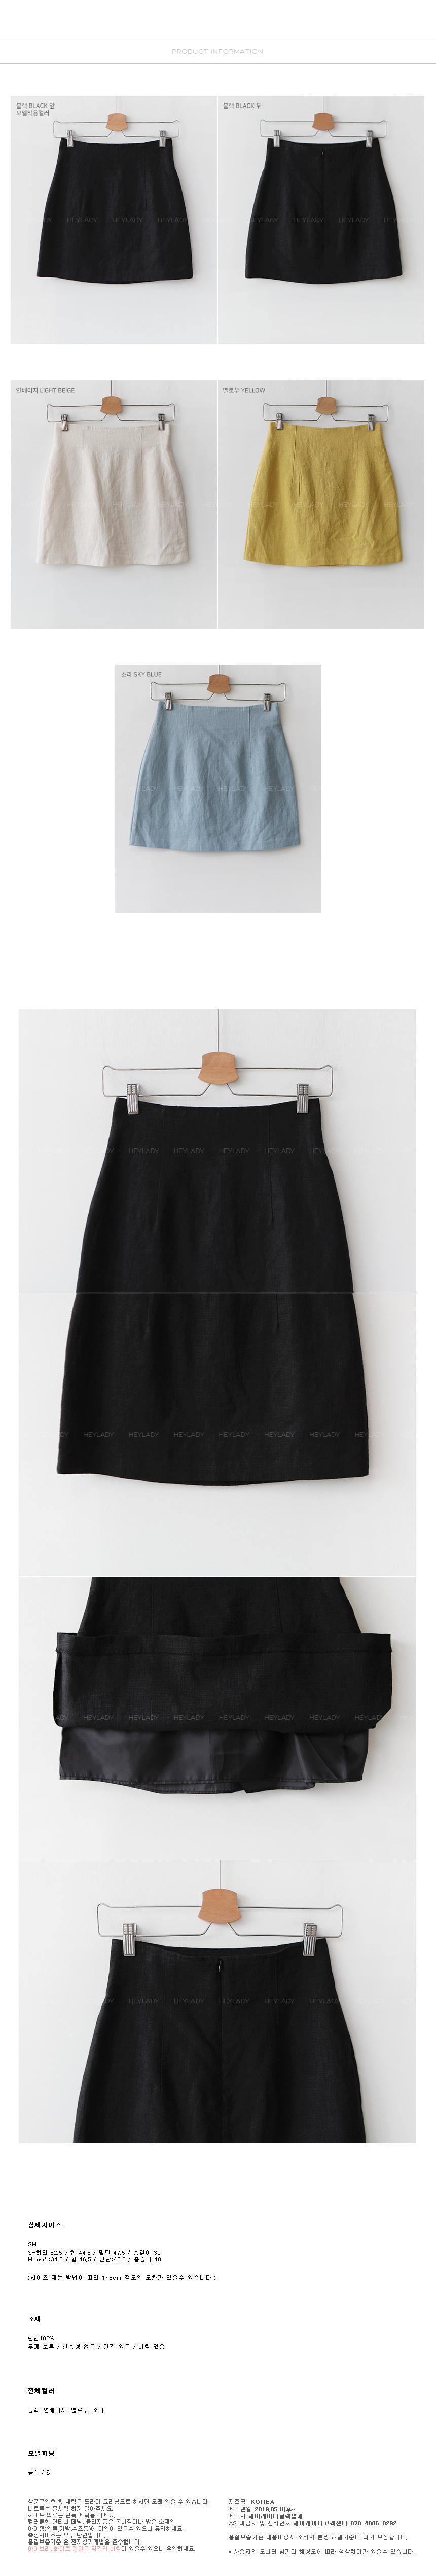 Life Linen Skirt